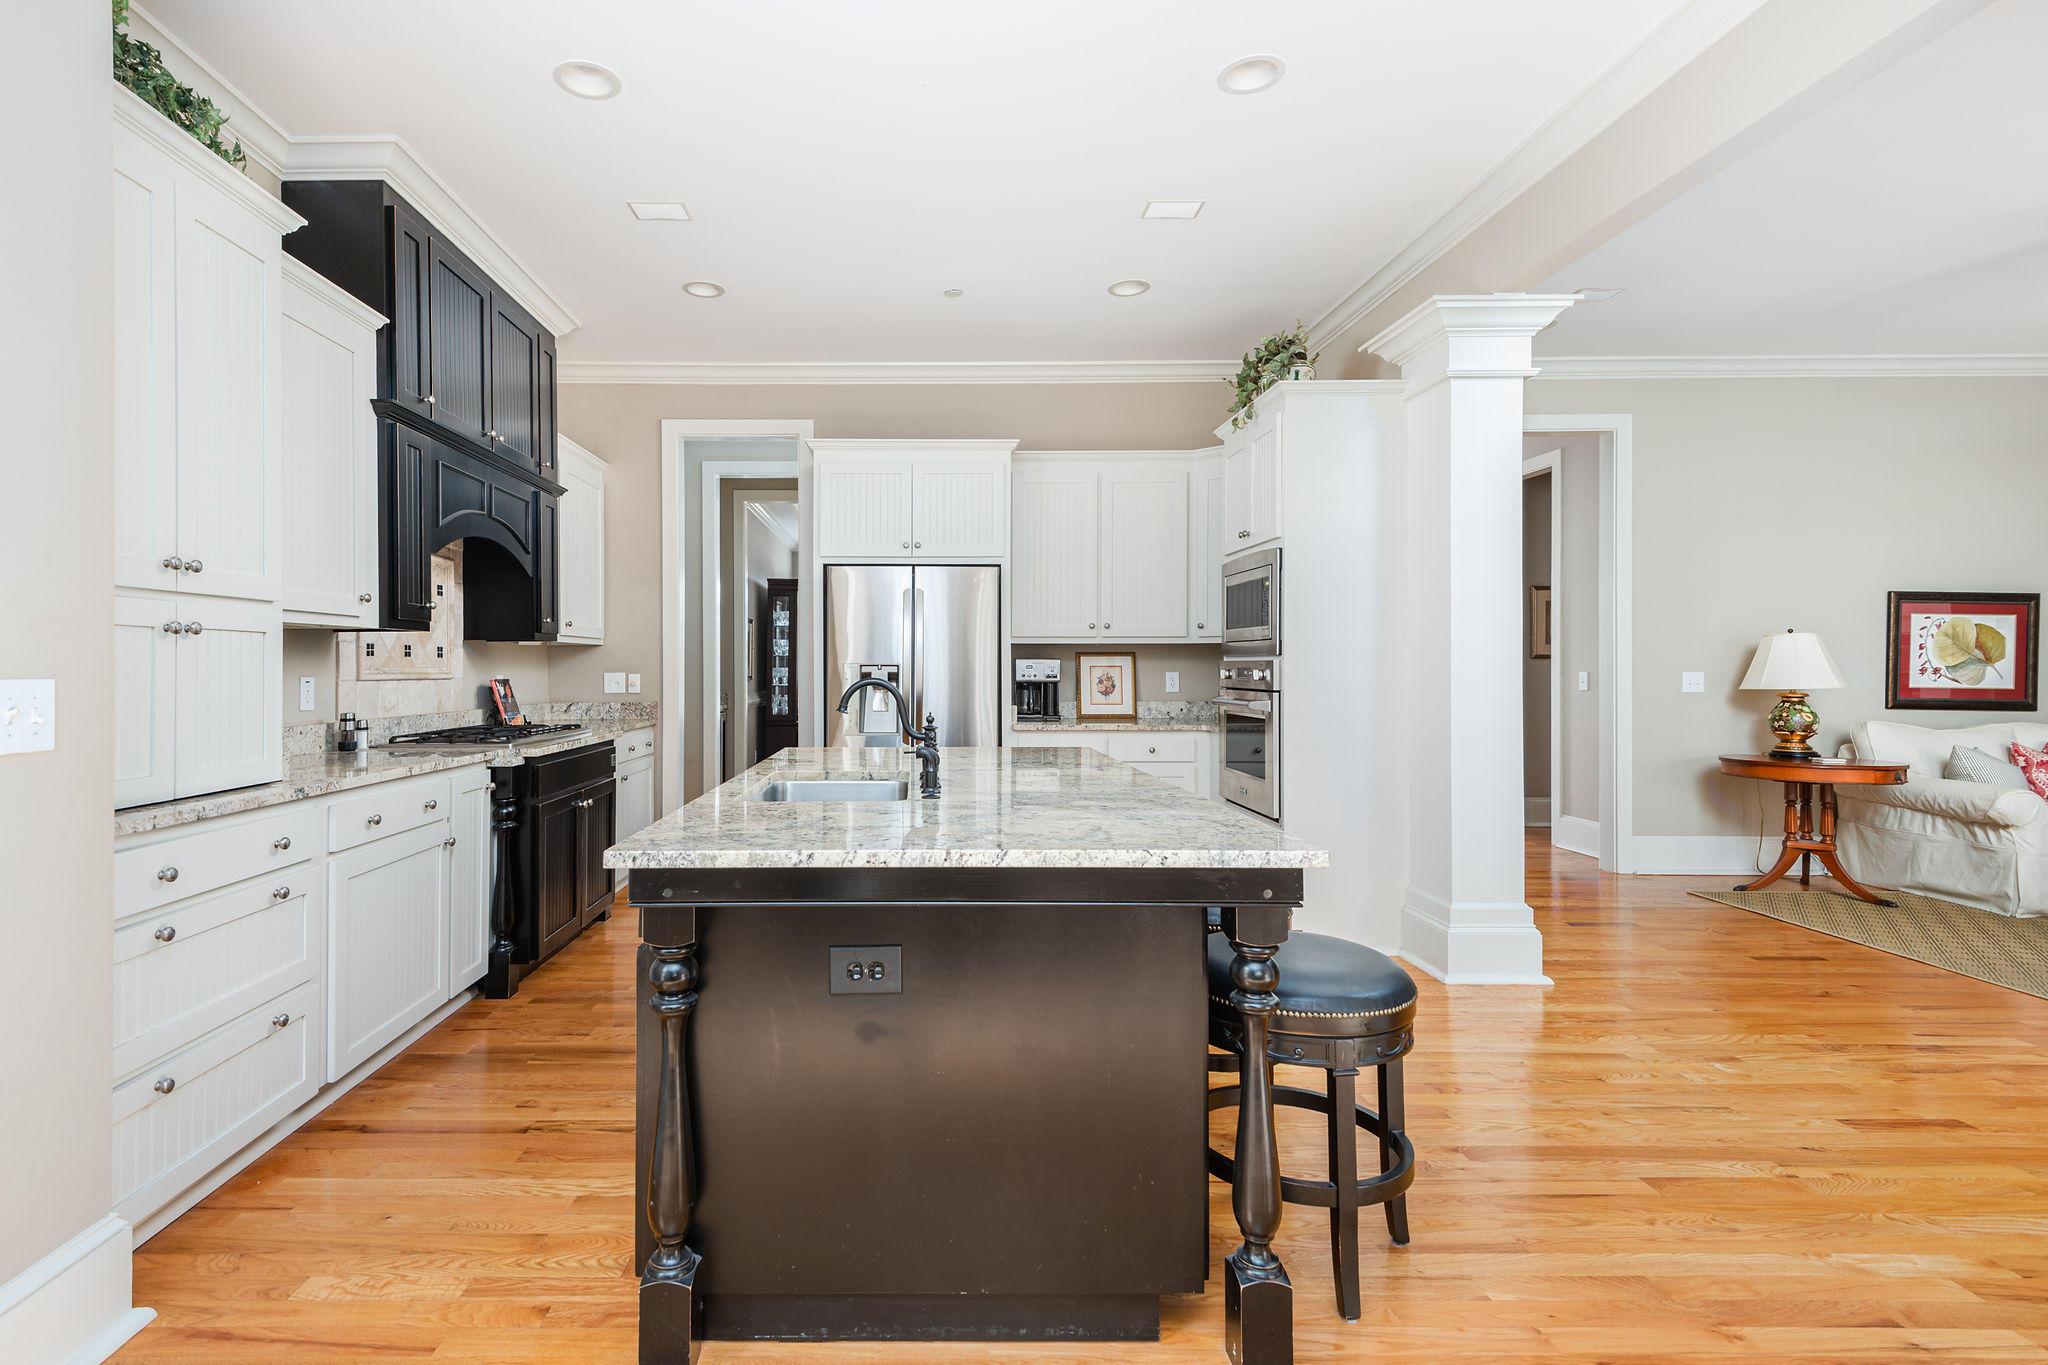 Dunes West Homes For Sale - 1305 King Bird, Mount Pleasant, SC - 56